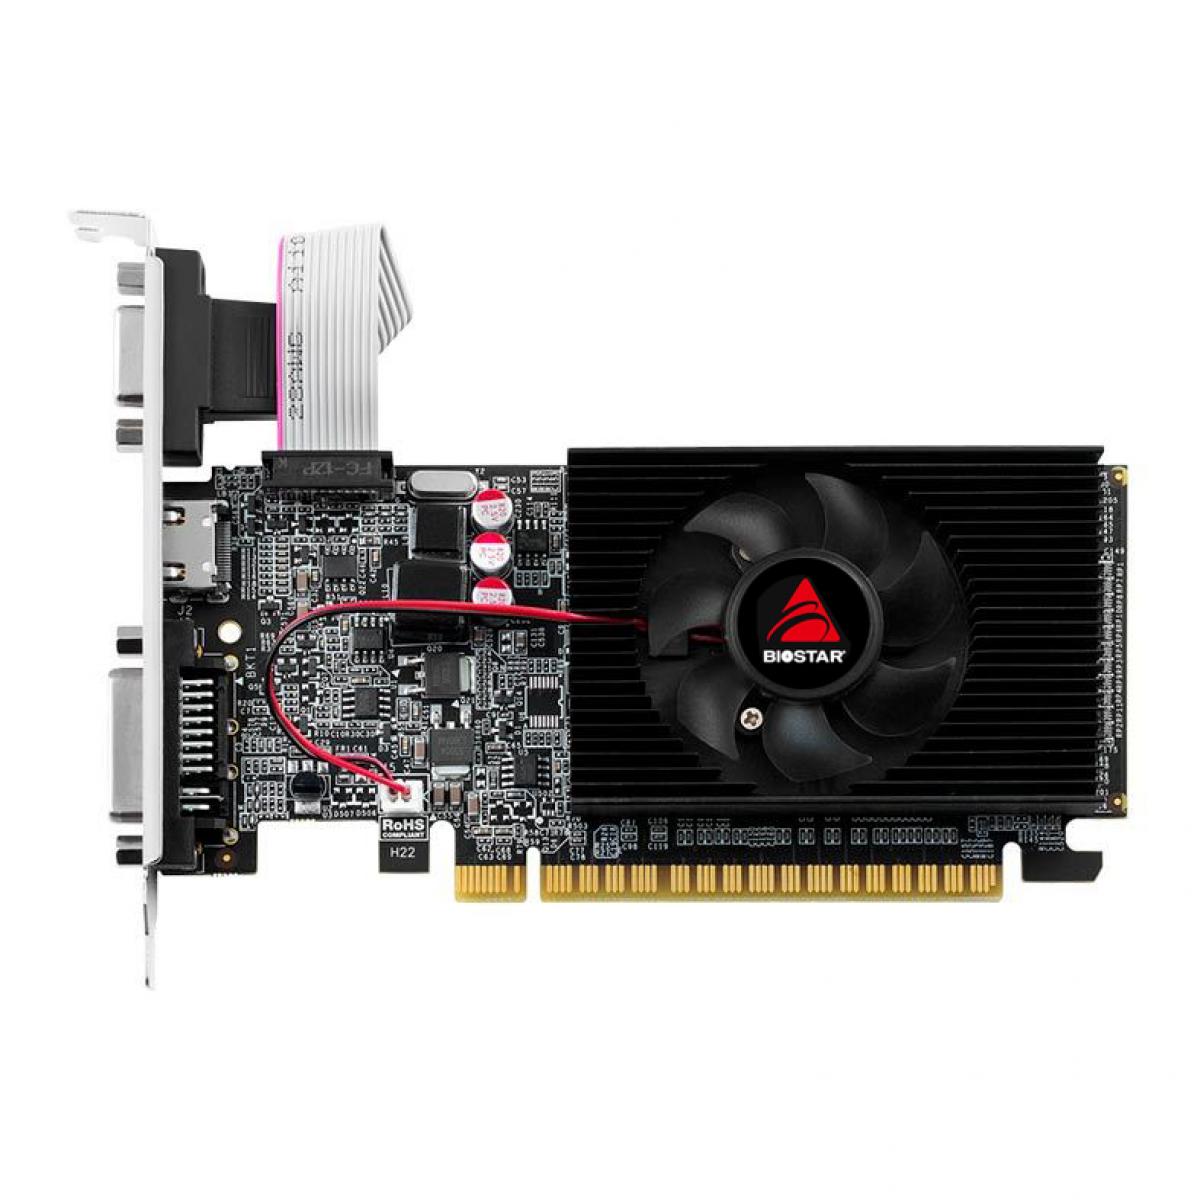 Placa de Vídeo Biostar GeForce GT 610, 2GB, DDR3, 64bit, VN6103NHX6